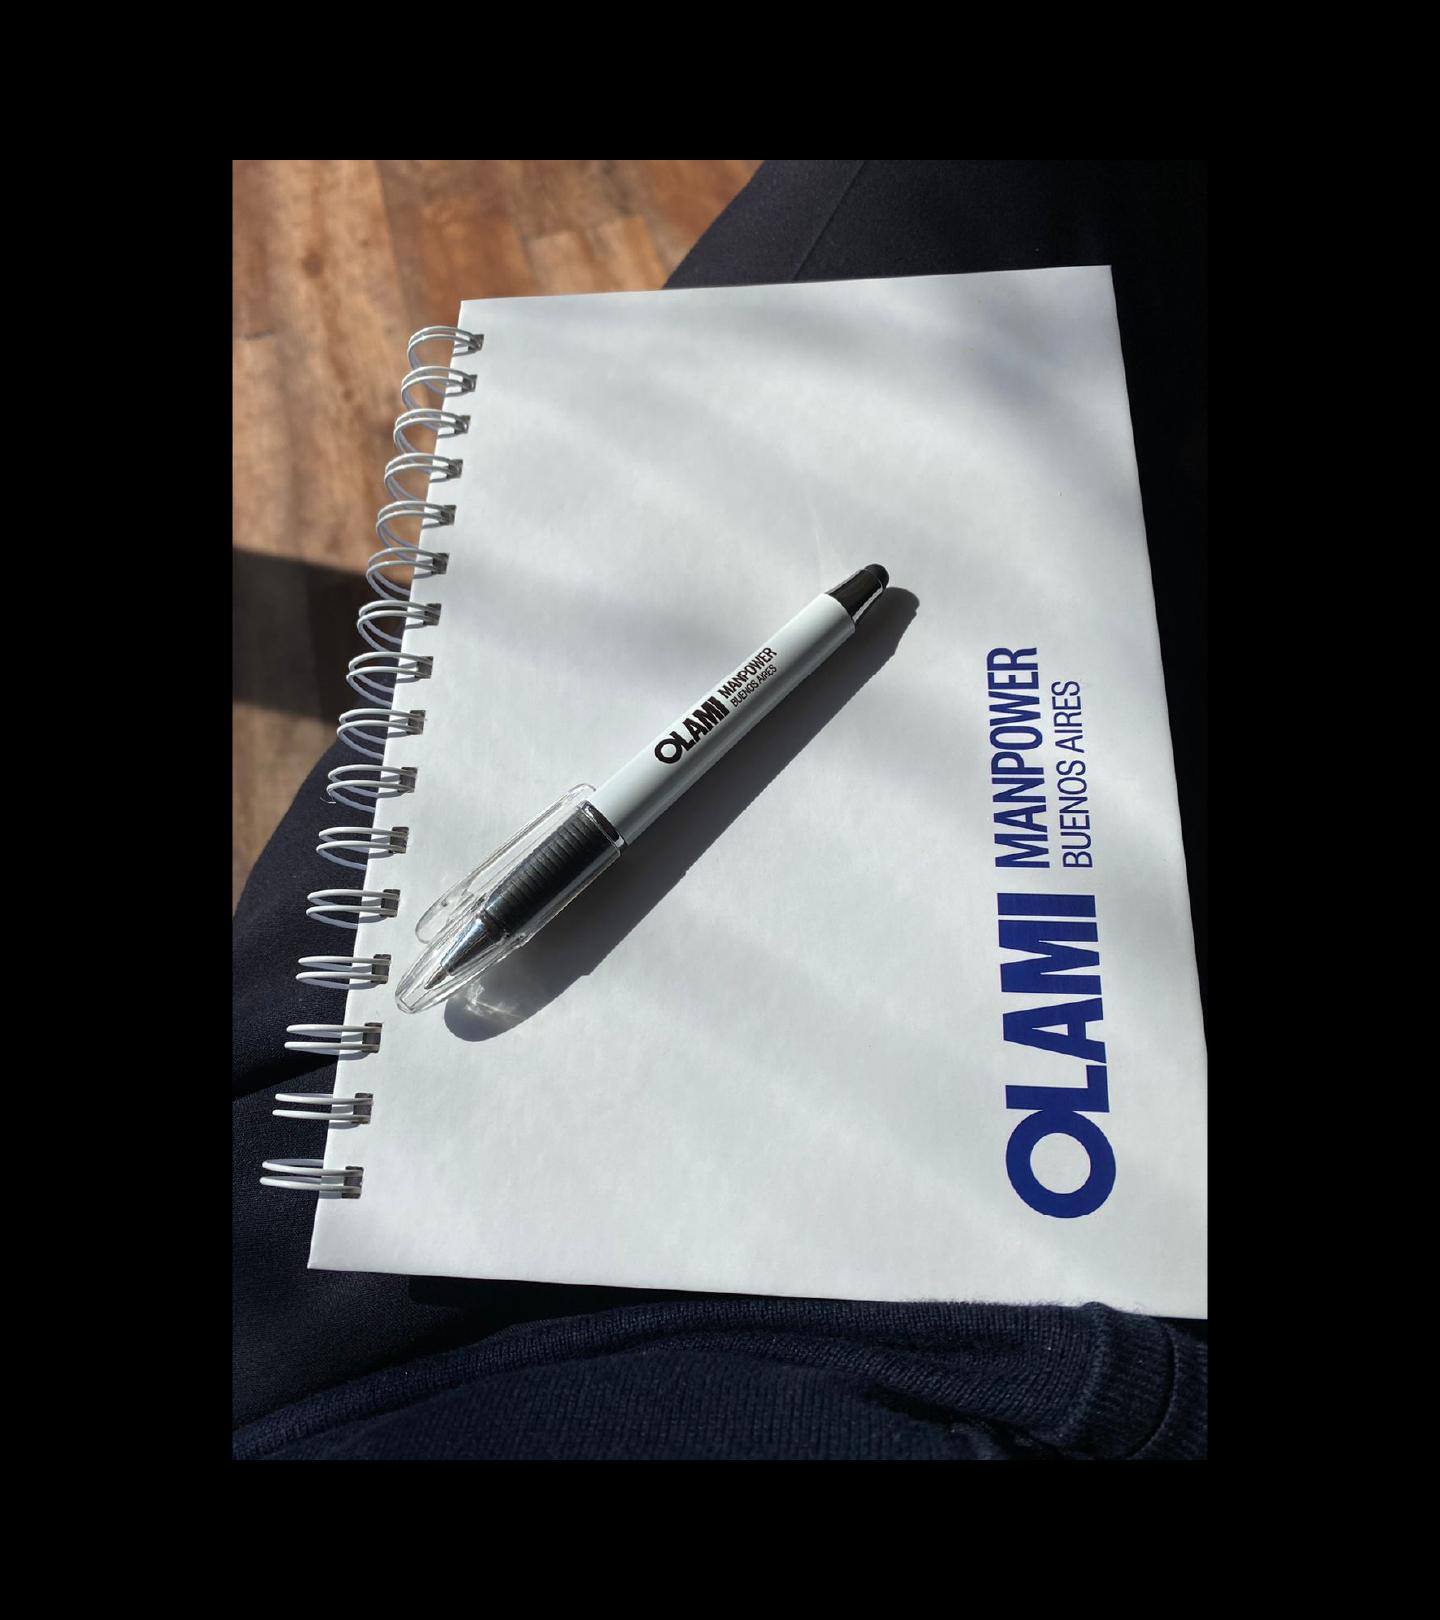 Olami-1-copy-4j